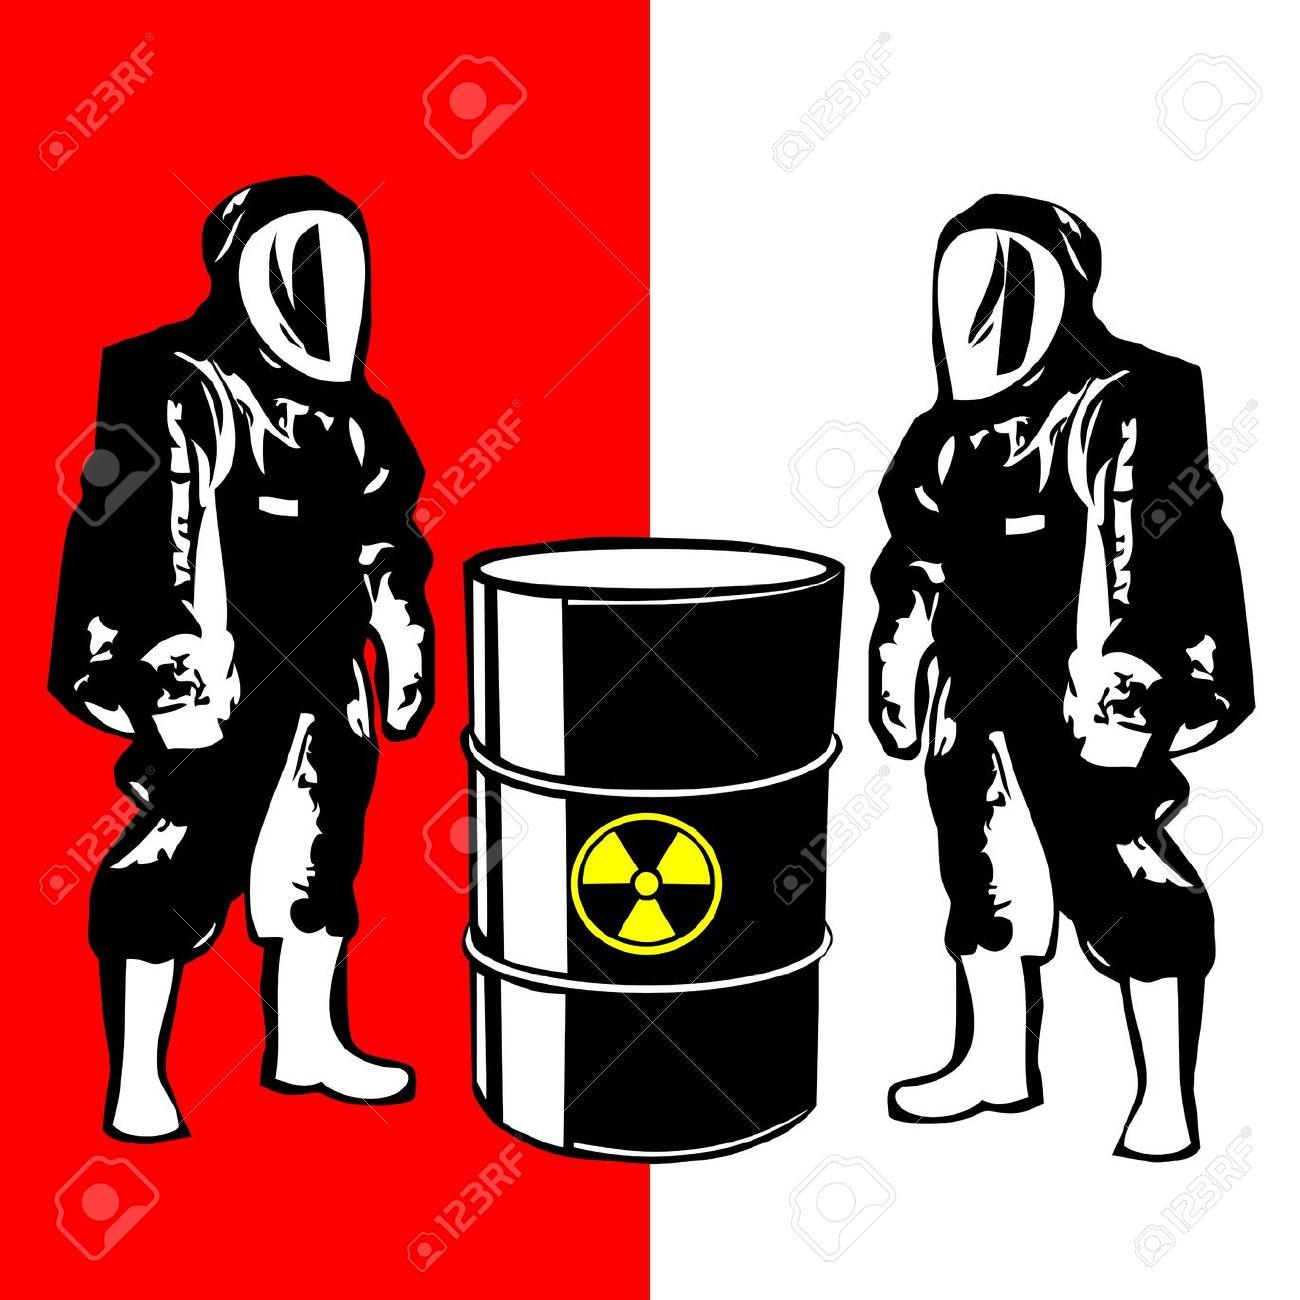 Biohazard . Chemical clipart hazardous chemical